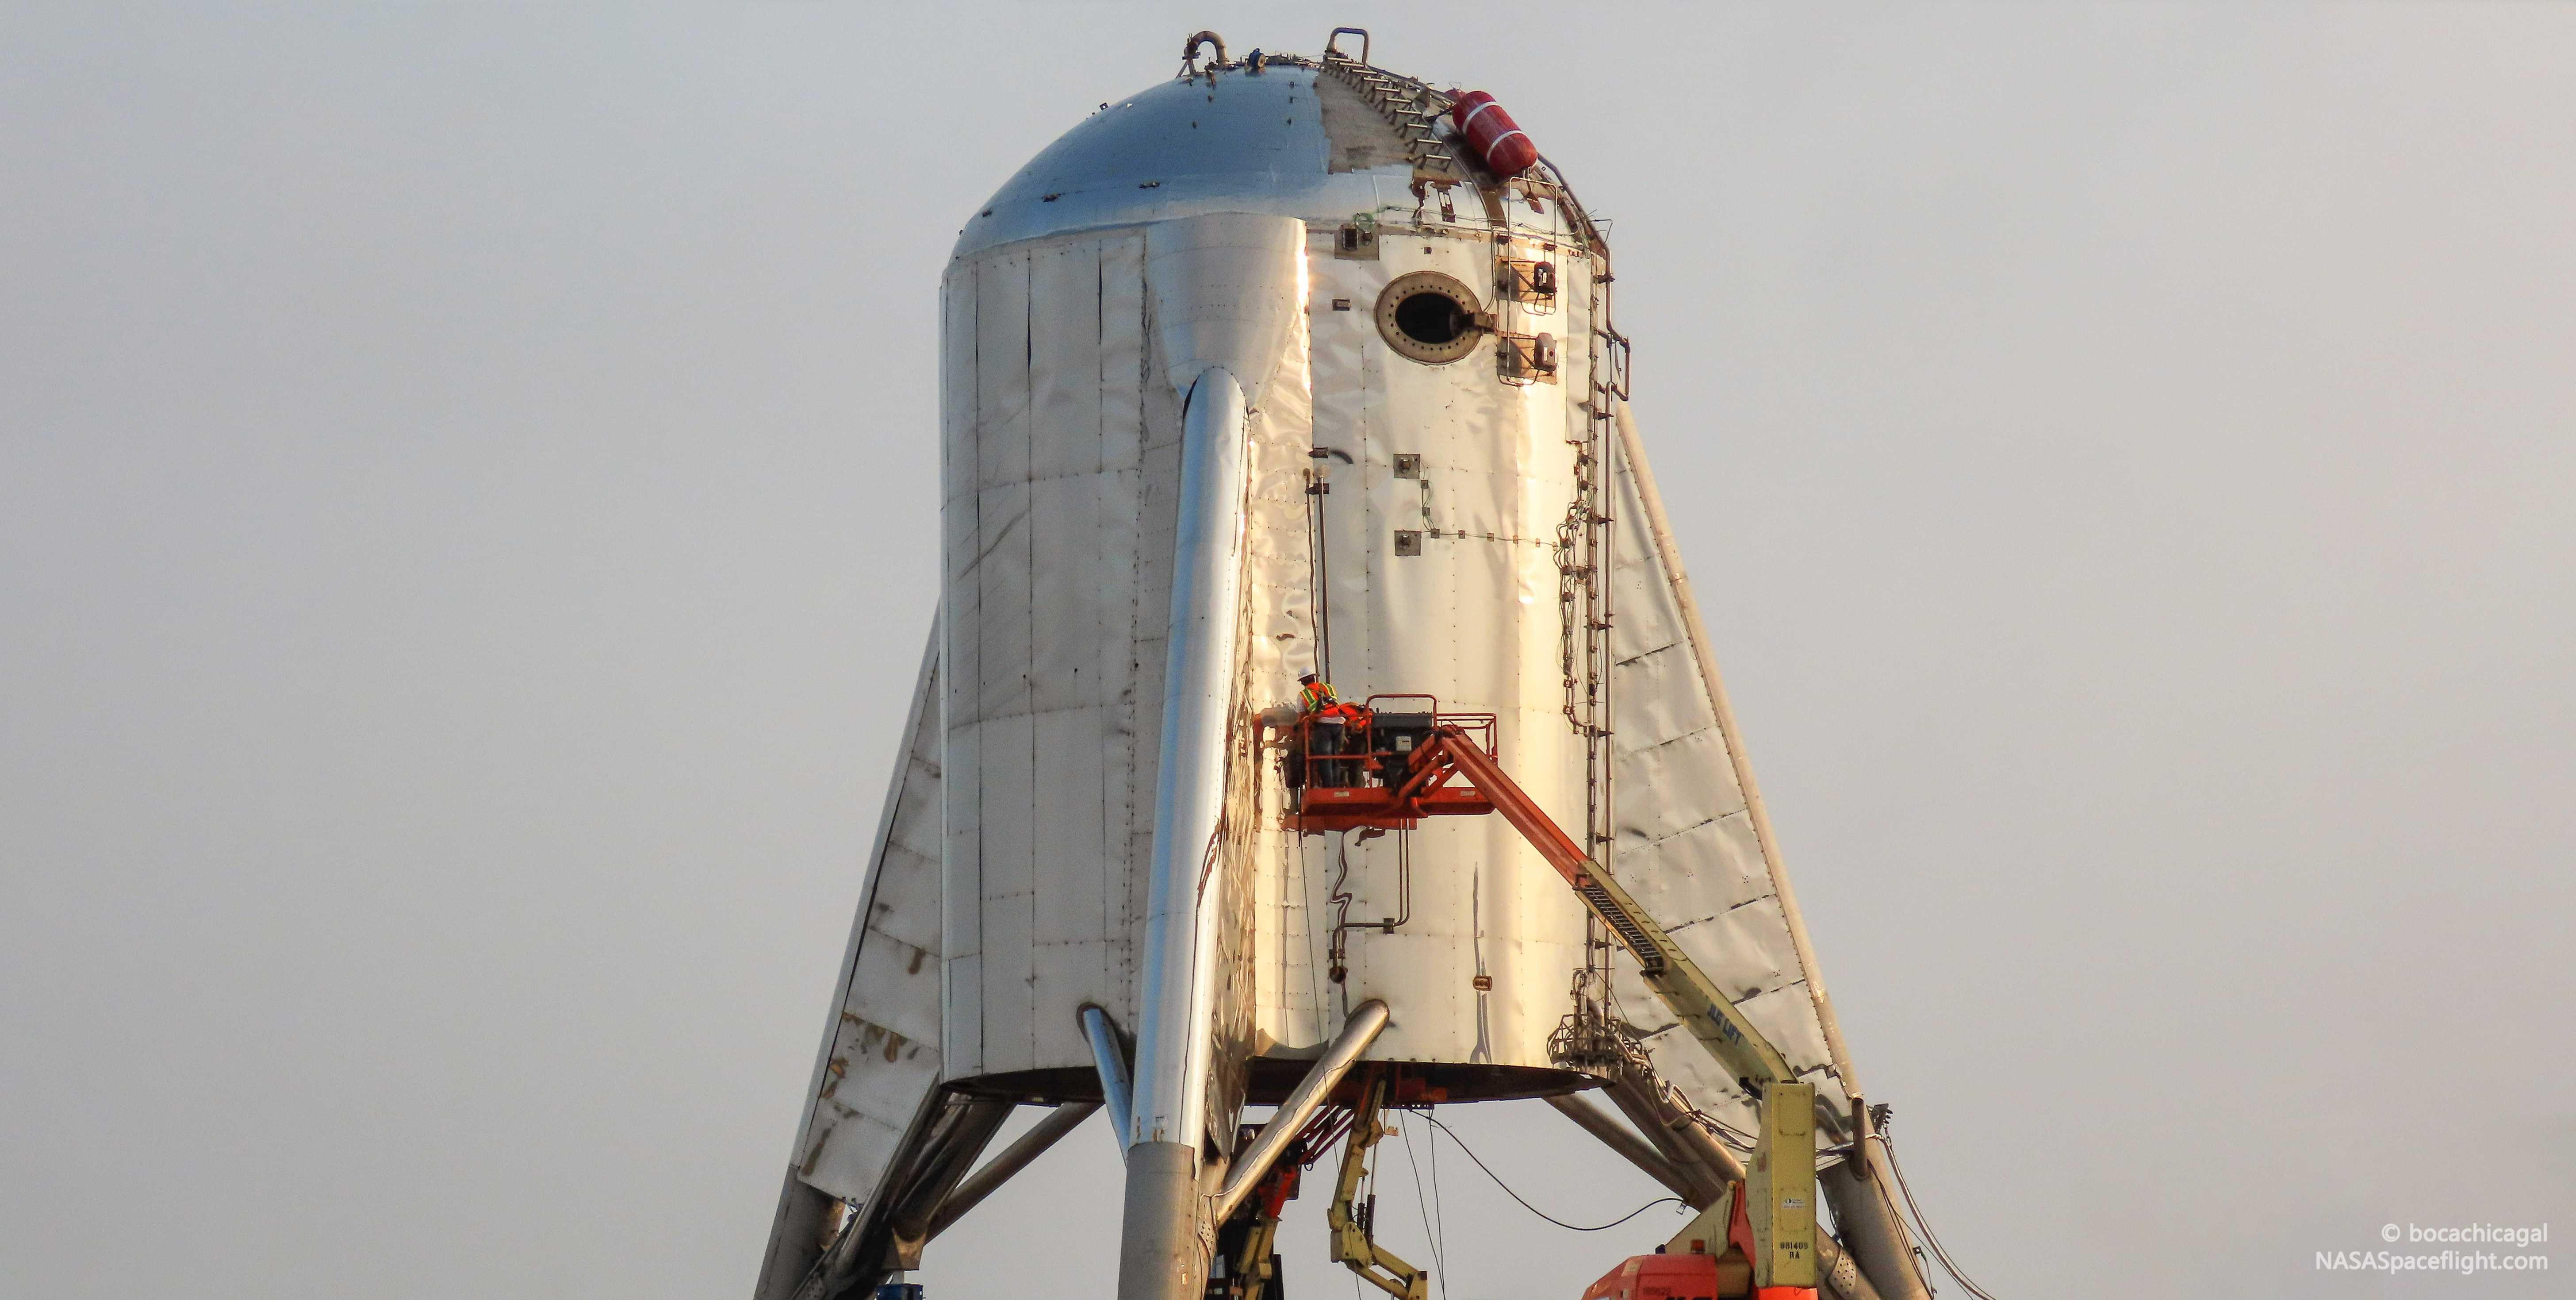 Boca Chica Starhopper & pad progress 051919 (NASASpaceflight – bocachicagal) 10 edit (c)